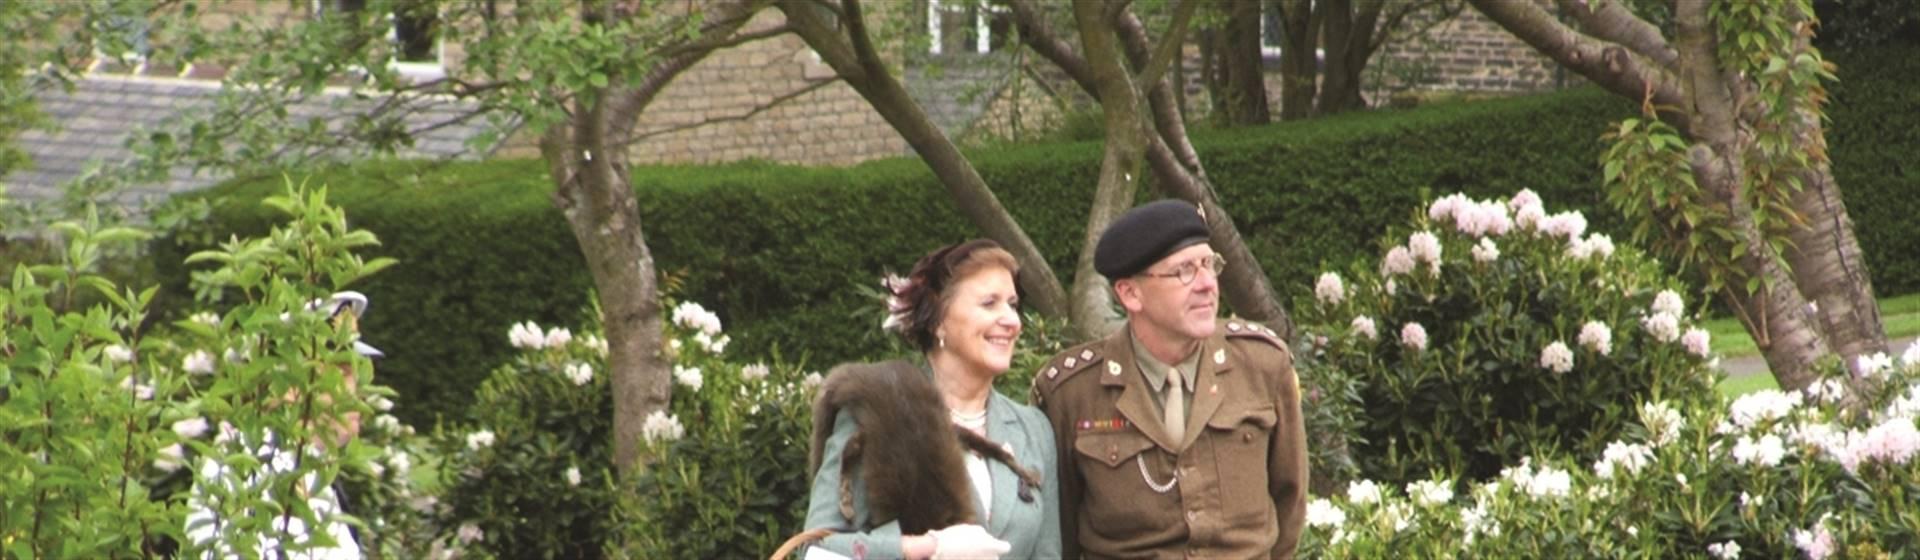 Haworth 1940's Weekend and Elegant Harrogate